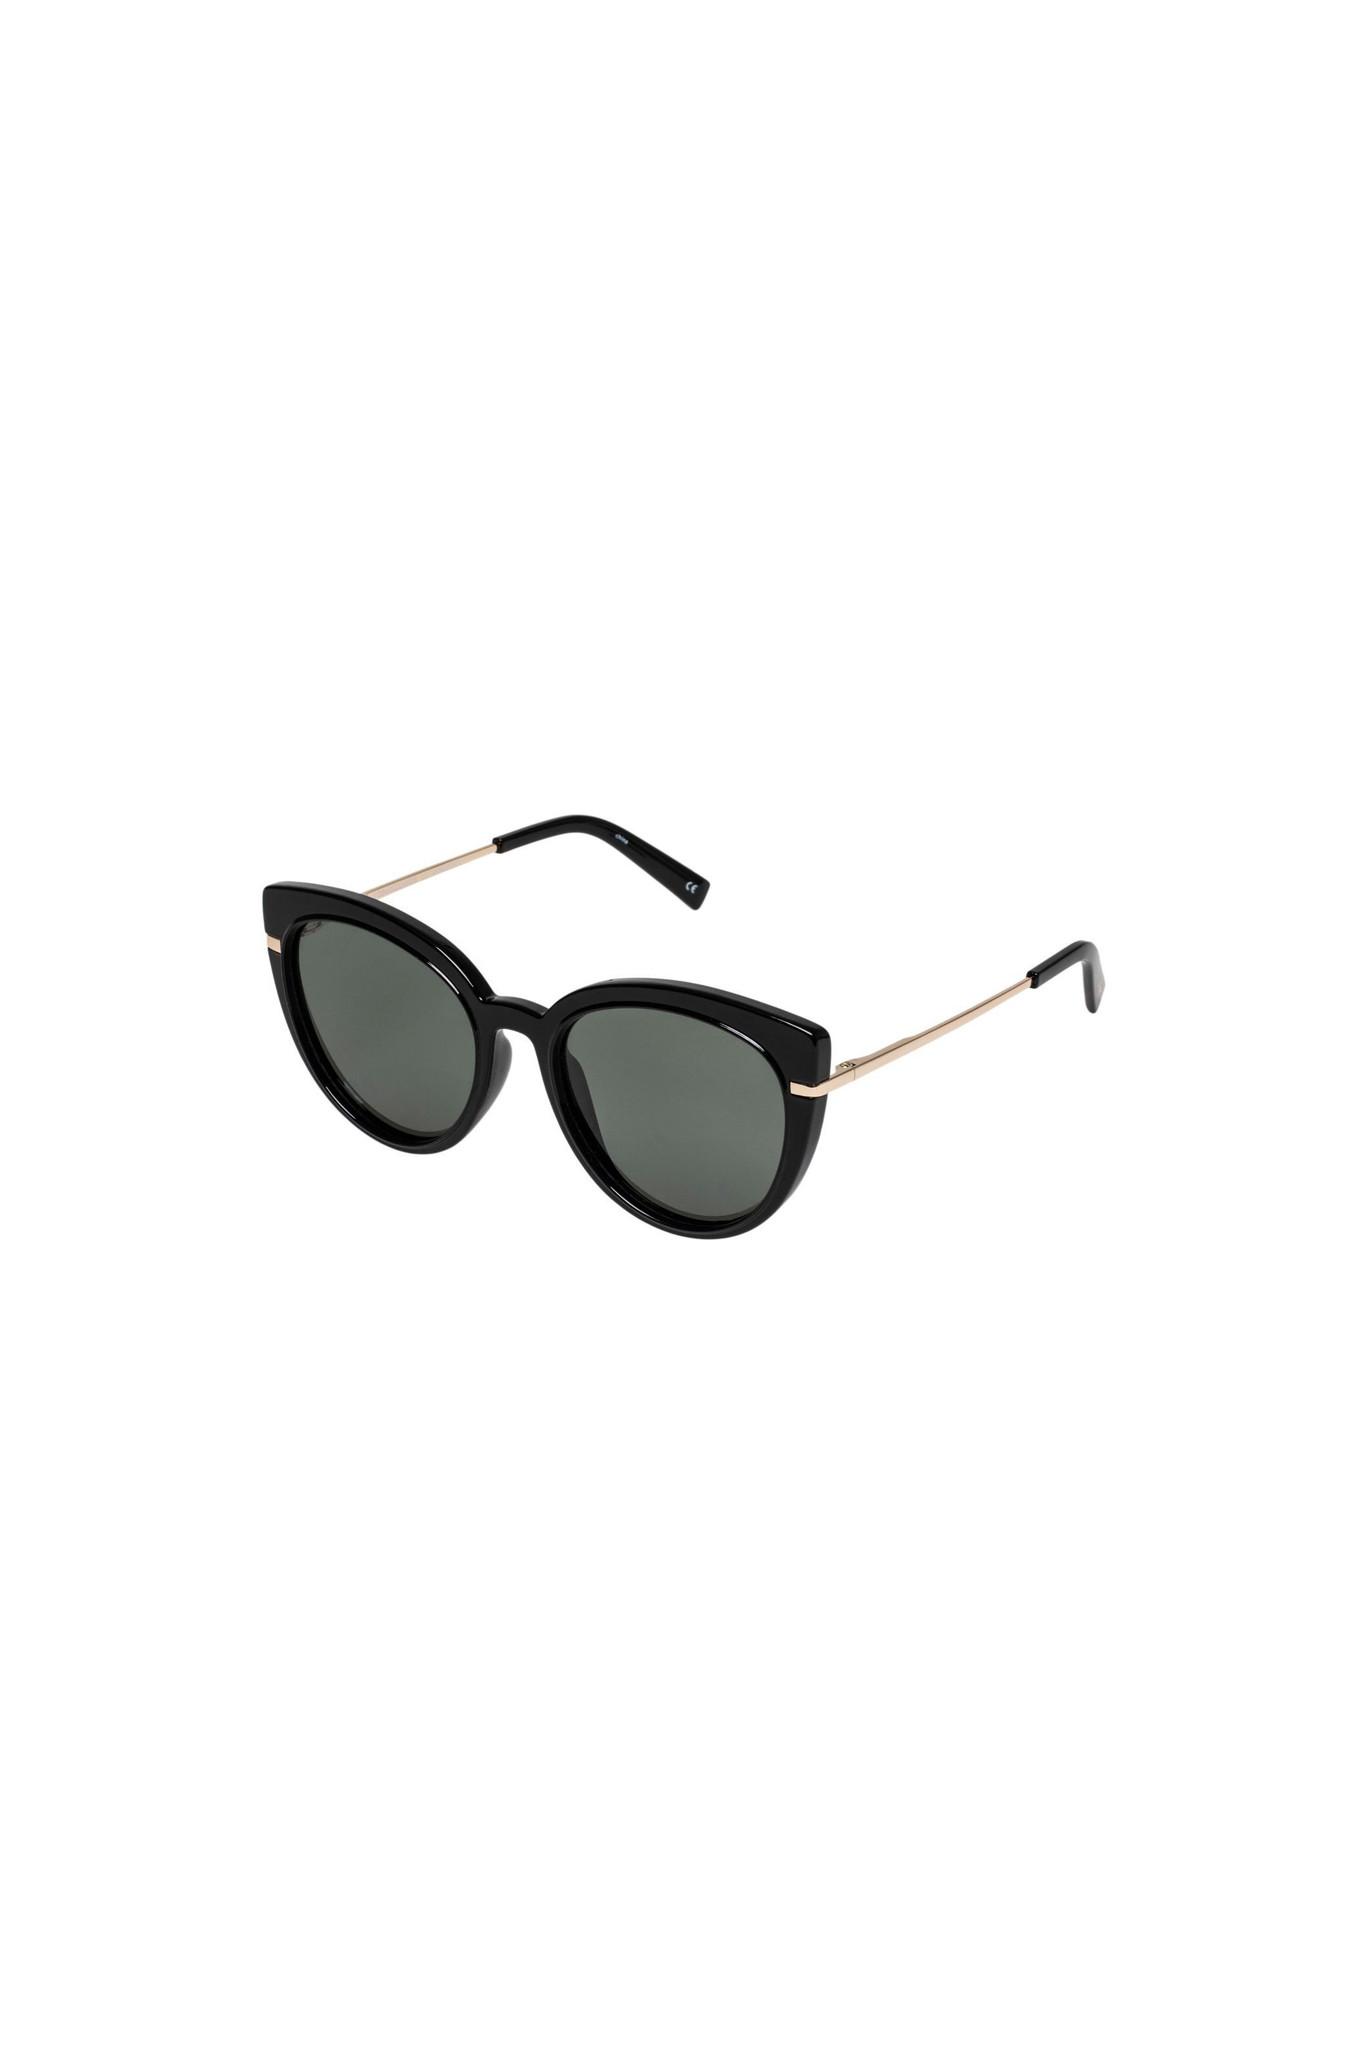 Promiscuous *Polarized* Sunglasses - Black-3